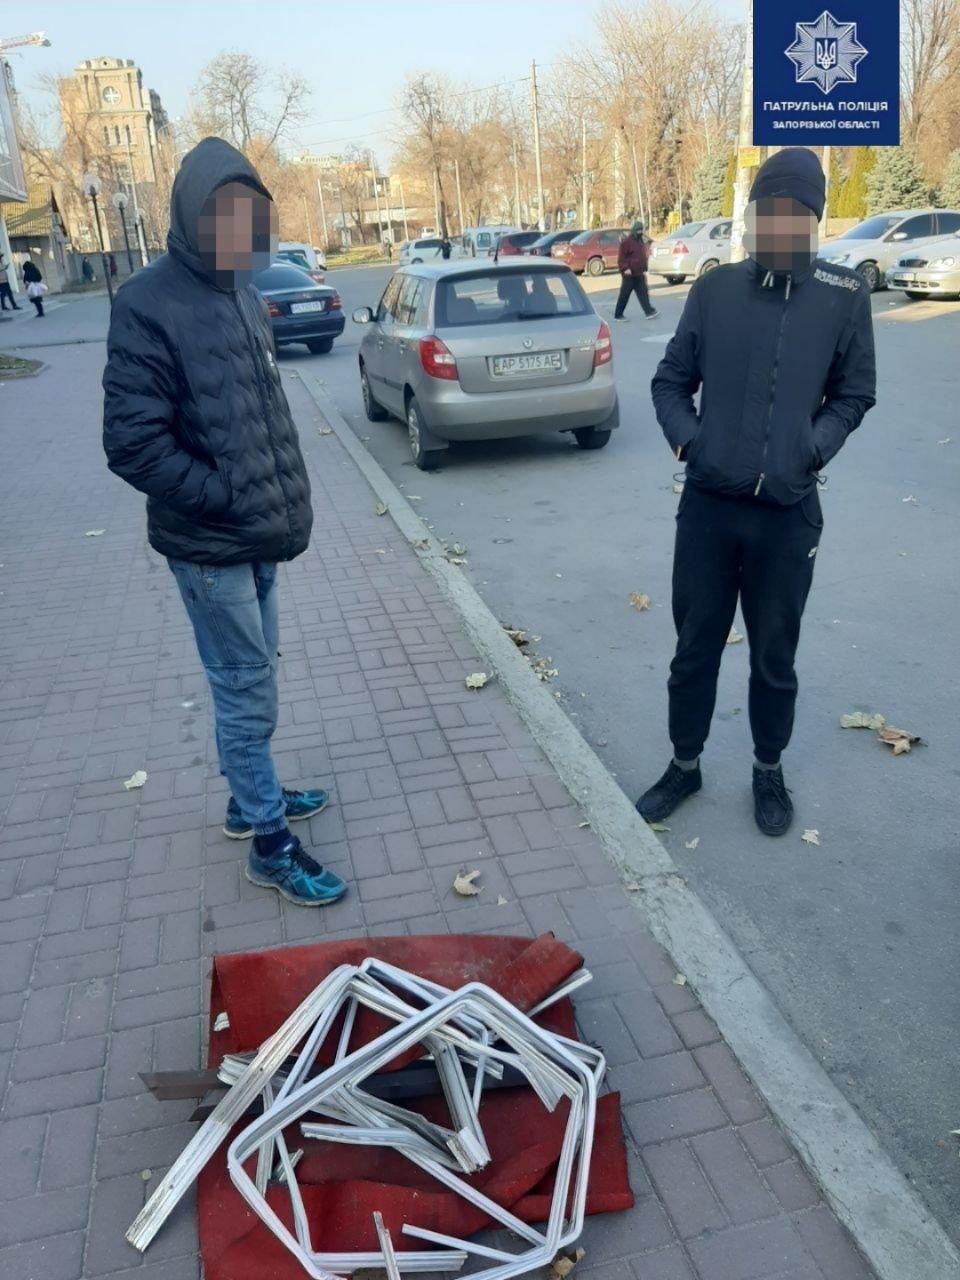 В Запорожье с купола фонтана украли металлические профили, - ФОТО, фото-1